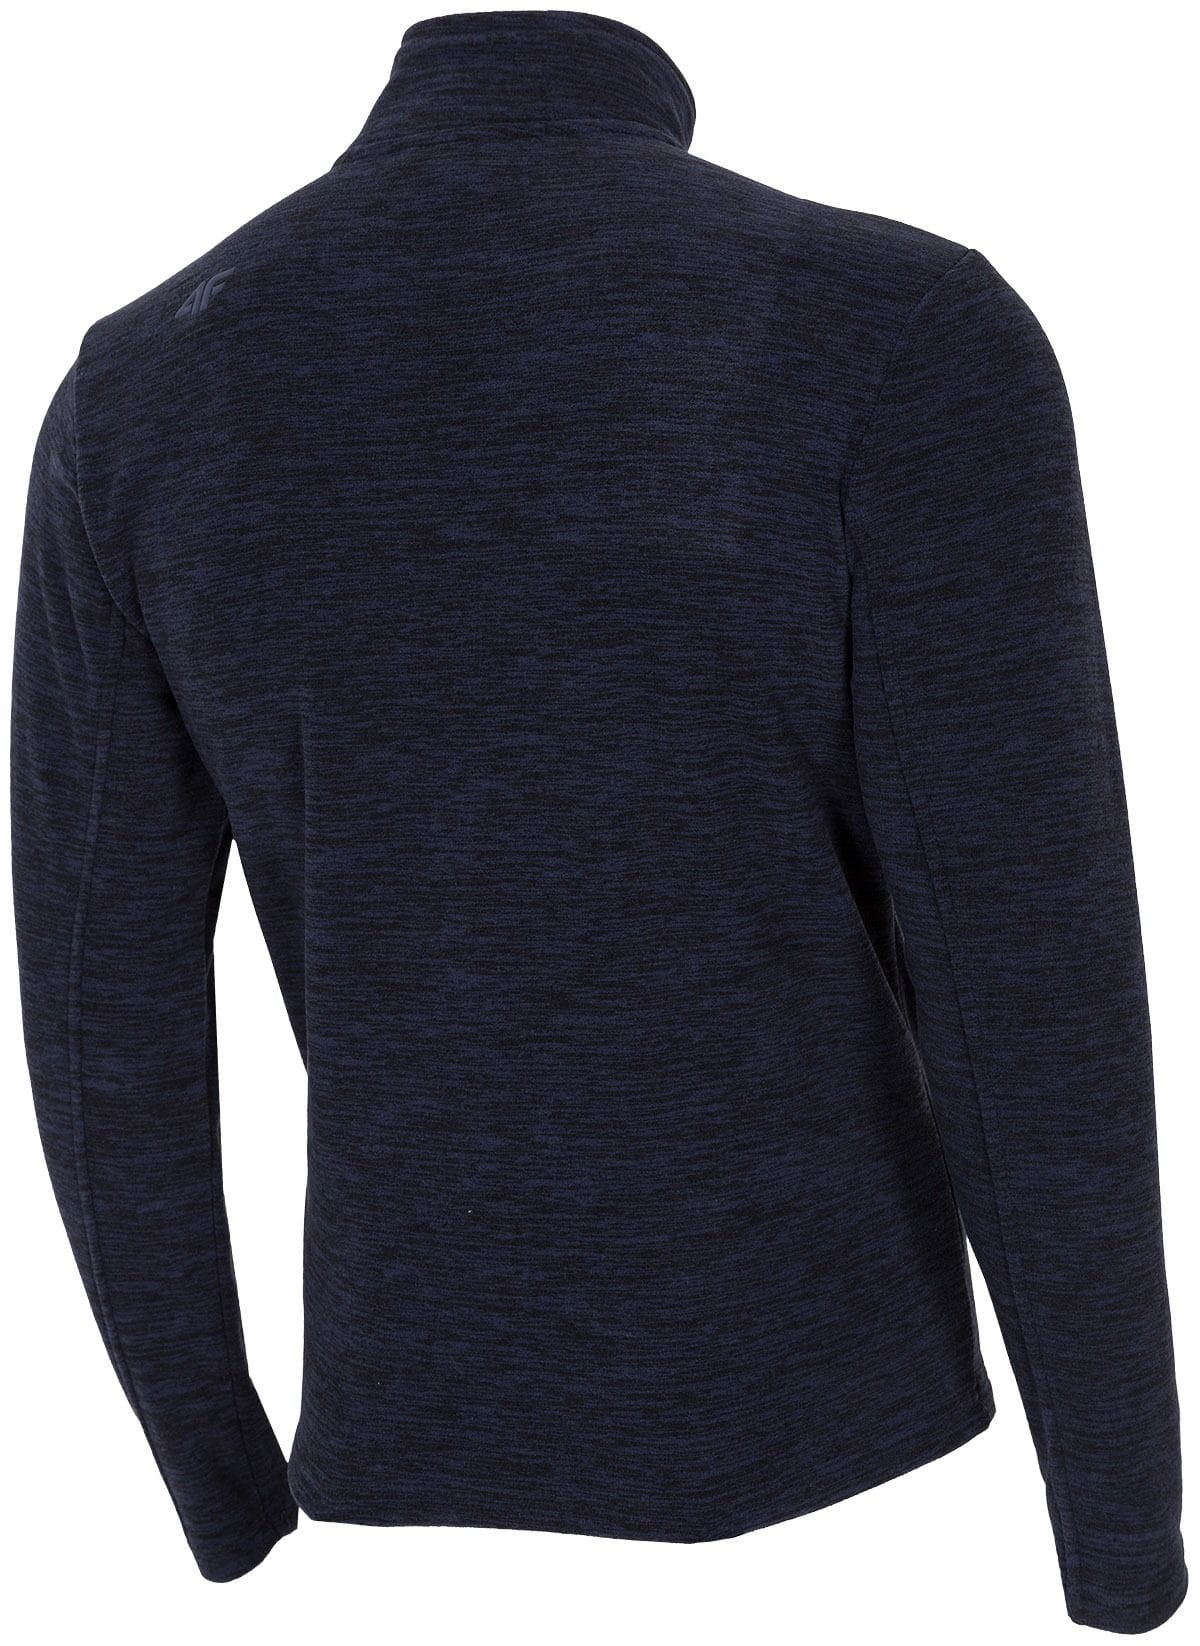 4F Mens Fleece plm001-30m b